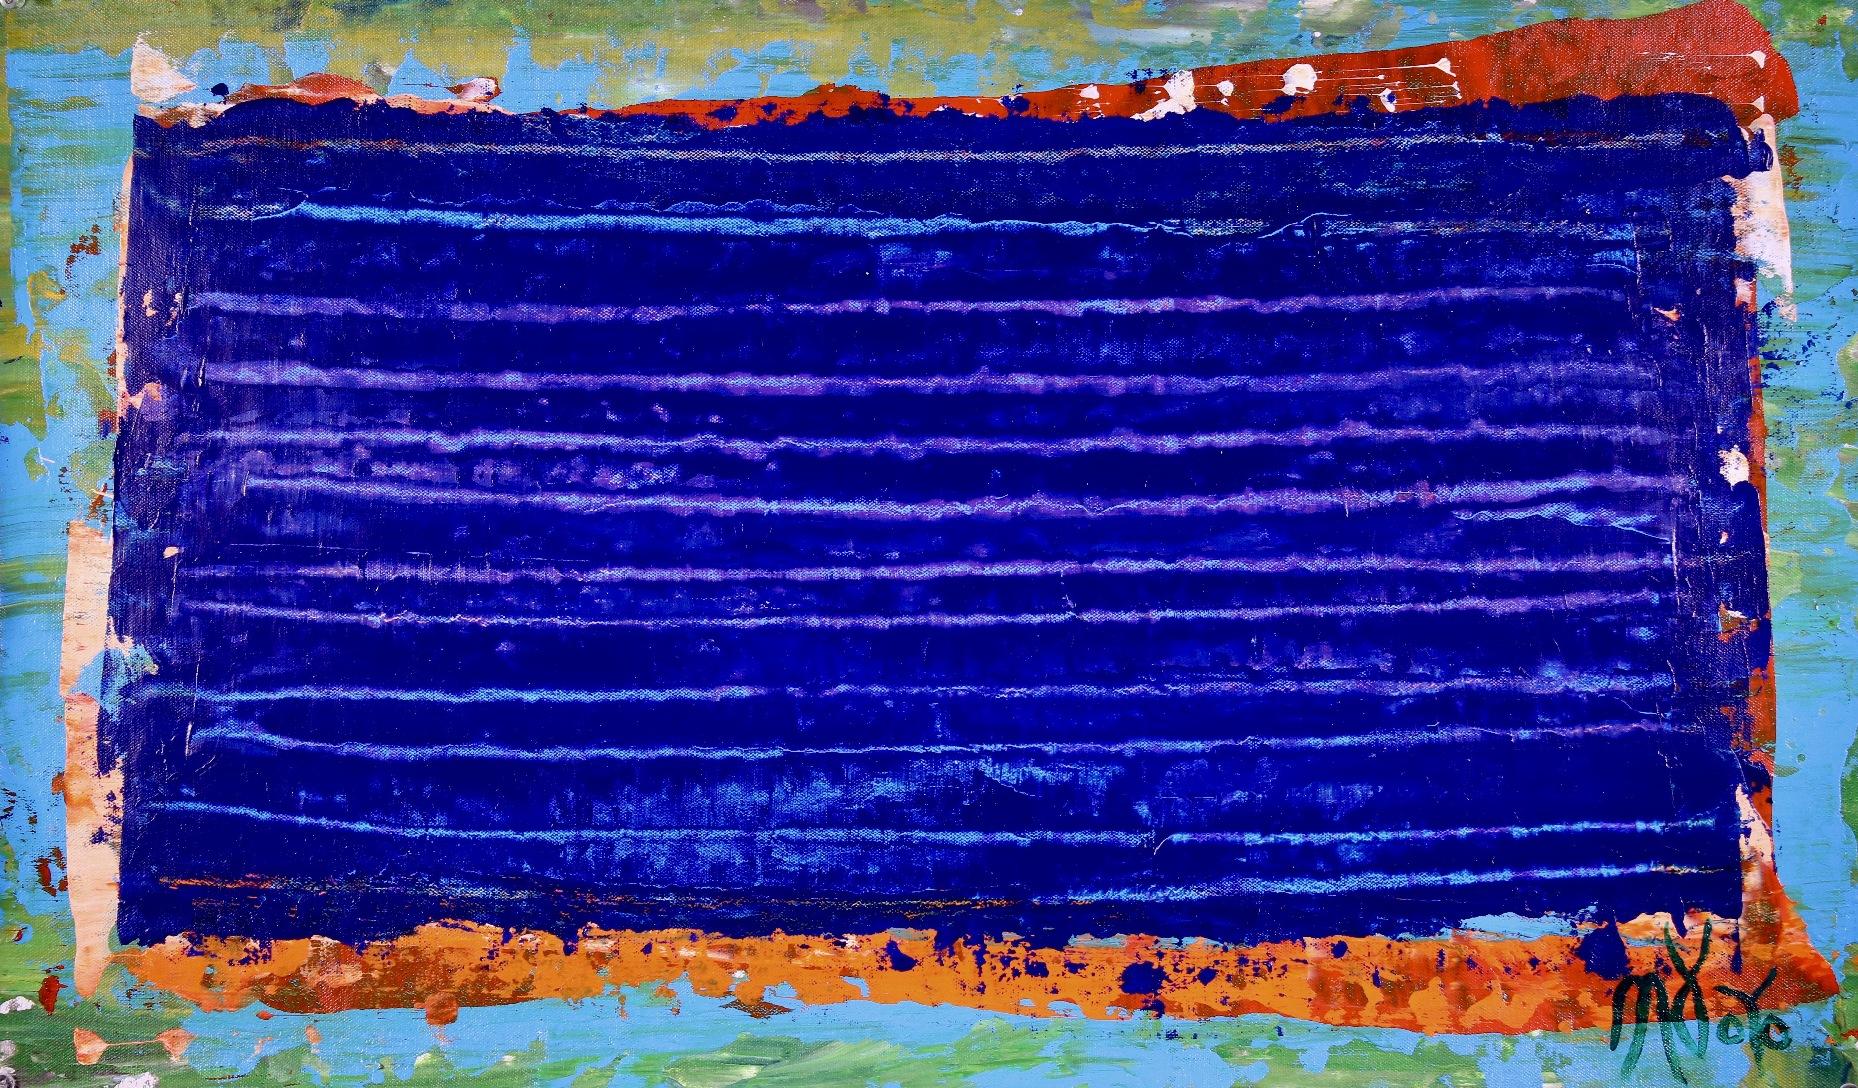 Under blue night light 2 (2018) Abstract Acrylic painting by Nestor Toro